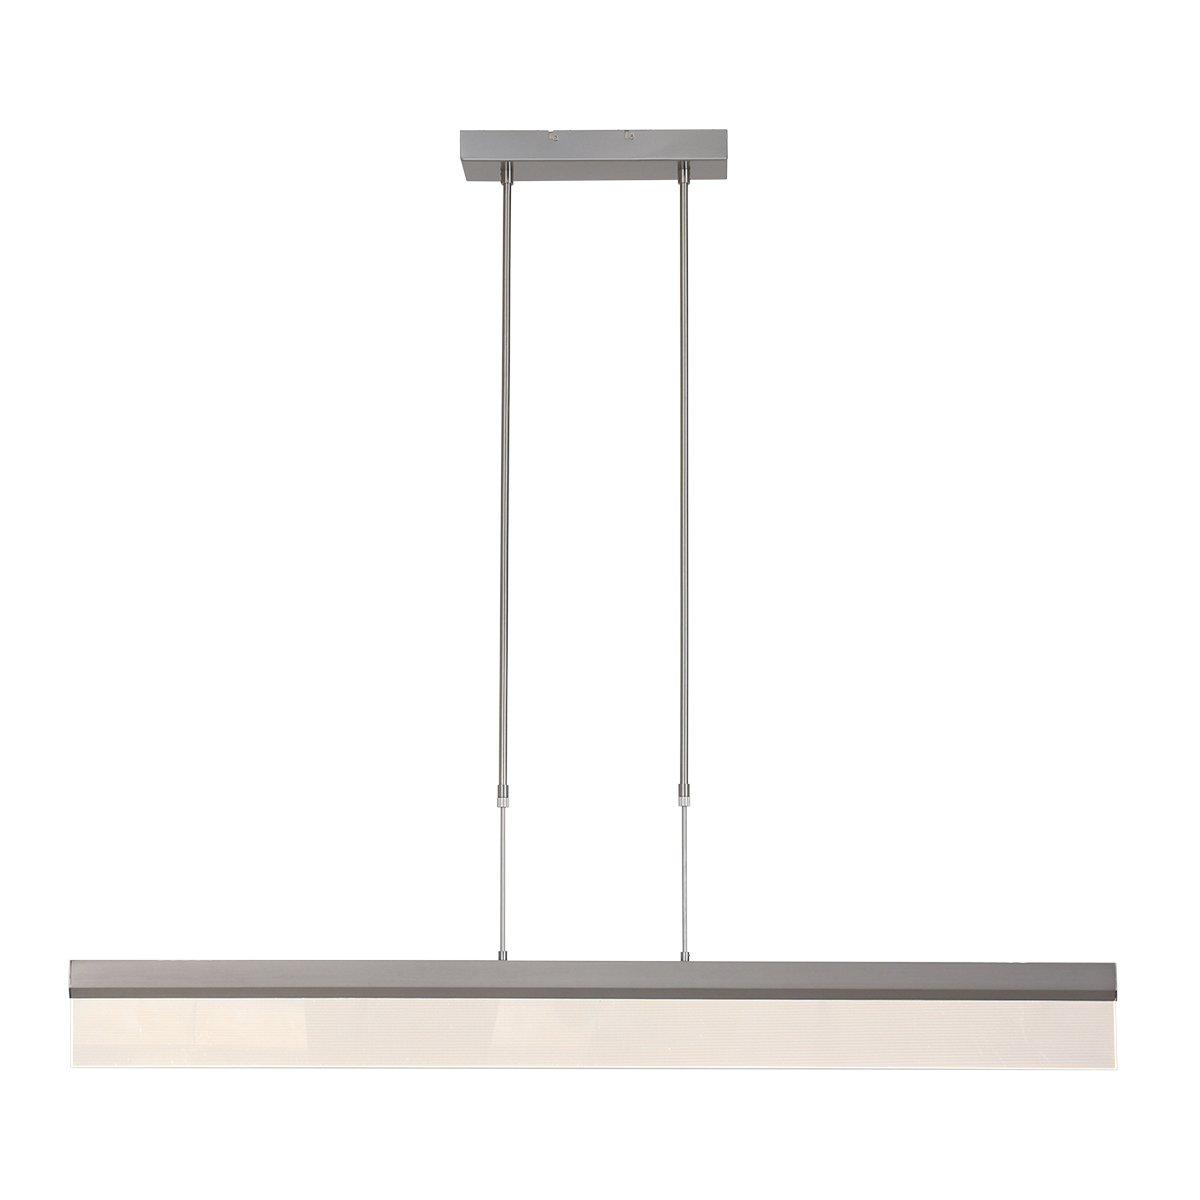 Hanglamp Steinhauer Atletiche Staal Kleur Instelbaar